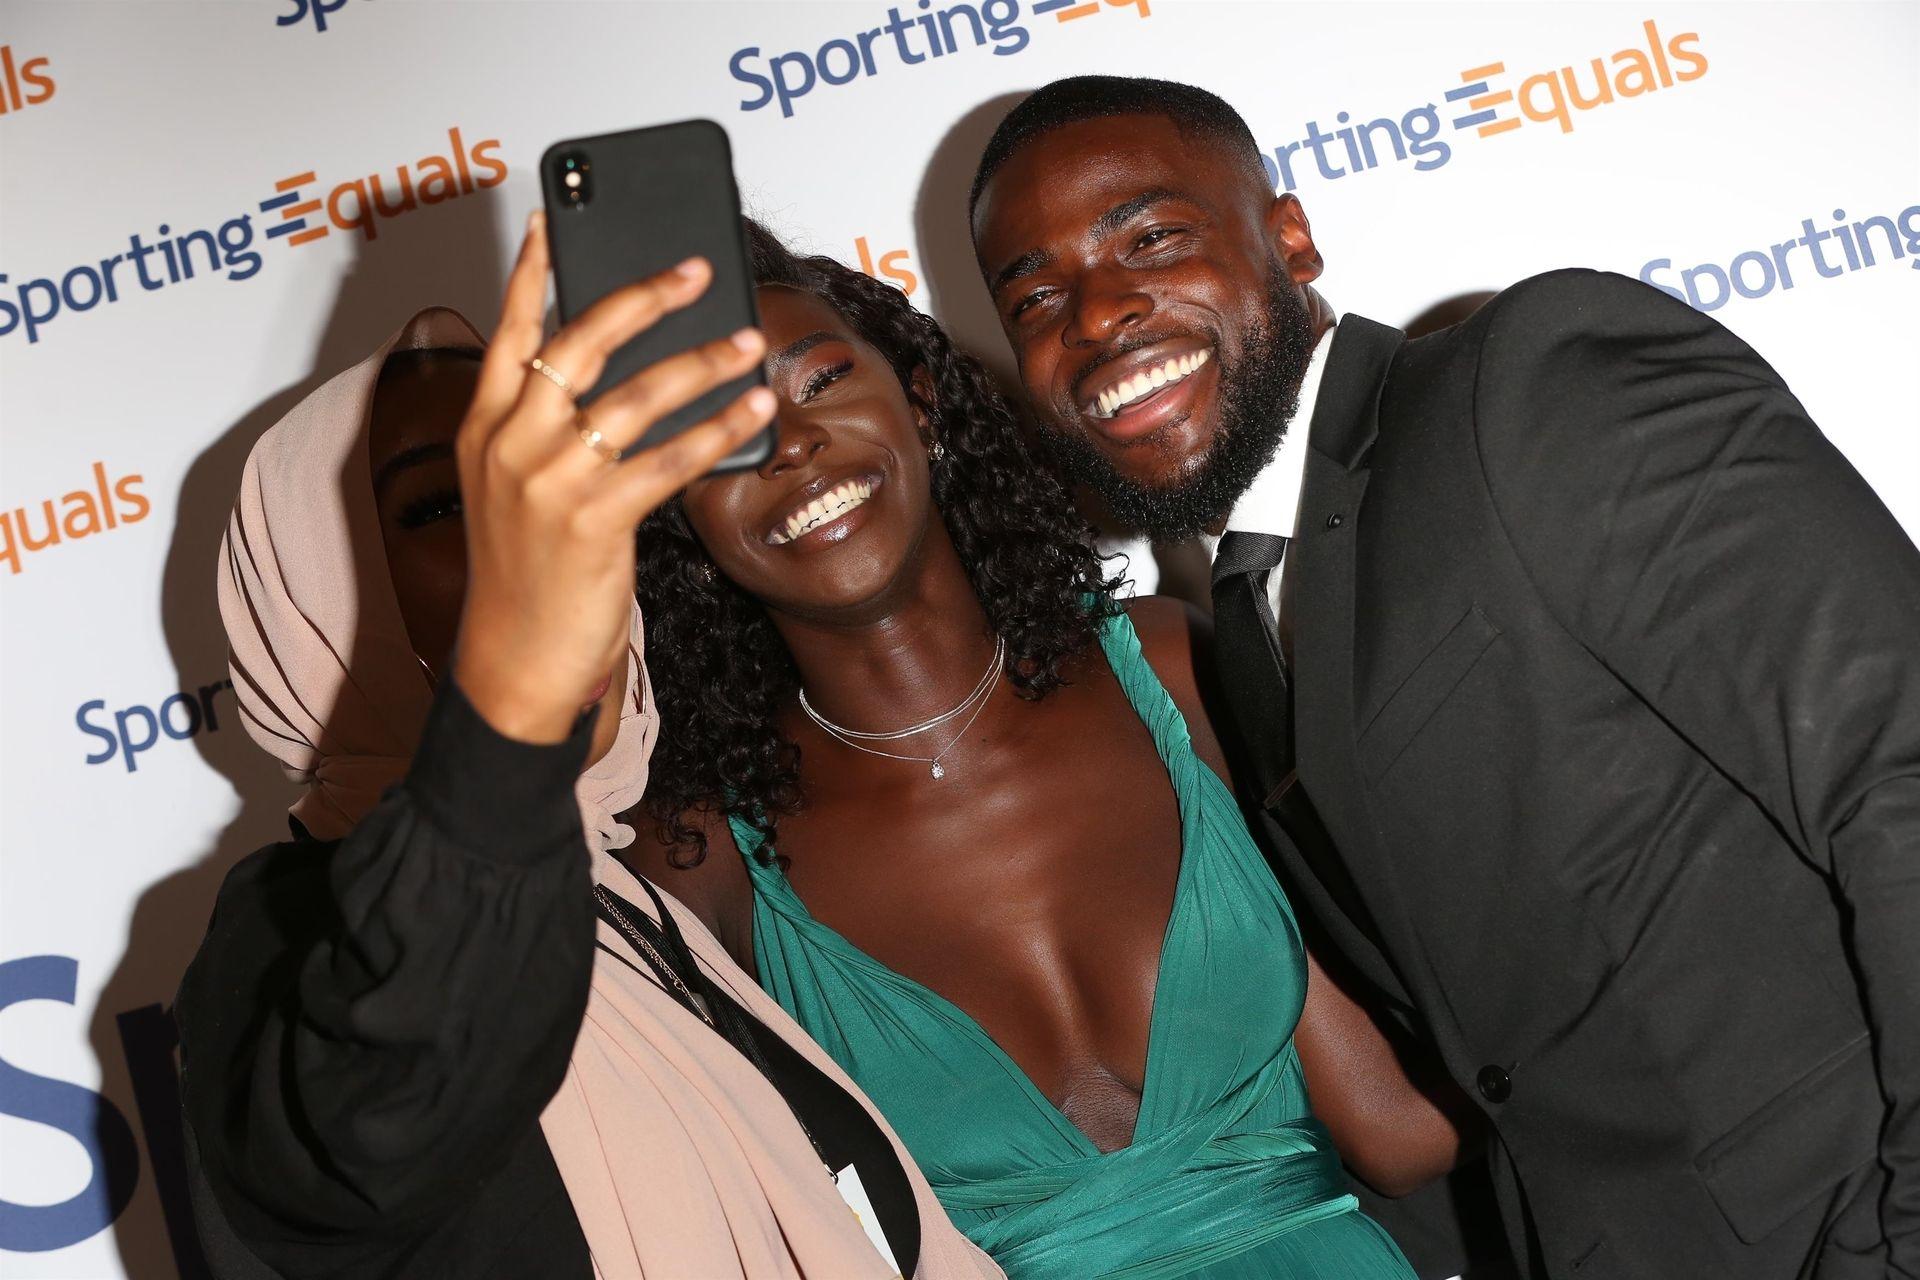 Mike Boateng & Priscilla Anyabu Are Seen At British Ethnic Diversity Sports Awards 0083